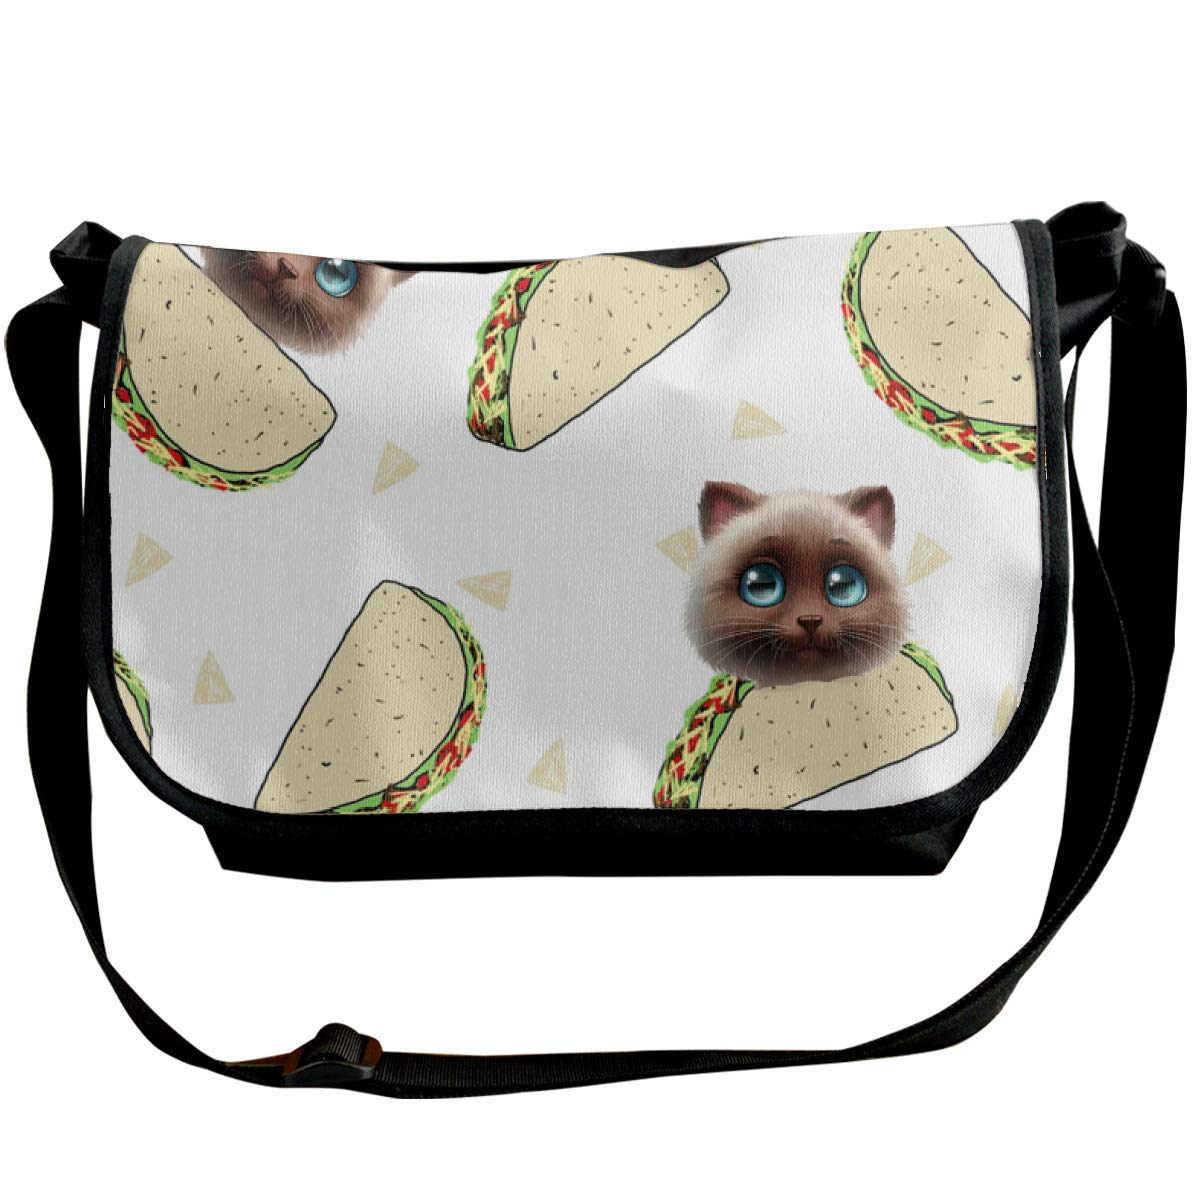 Futong Huaxia Cat Taco Travel Messenger Bags Handbag Shoulder Bag Crossbody Bag Unisex